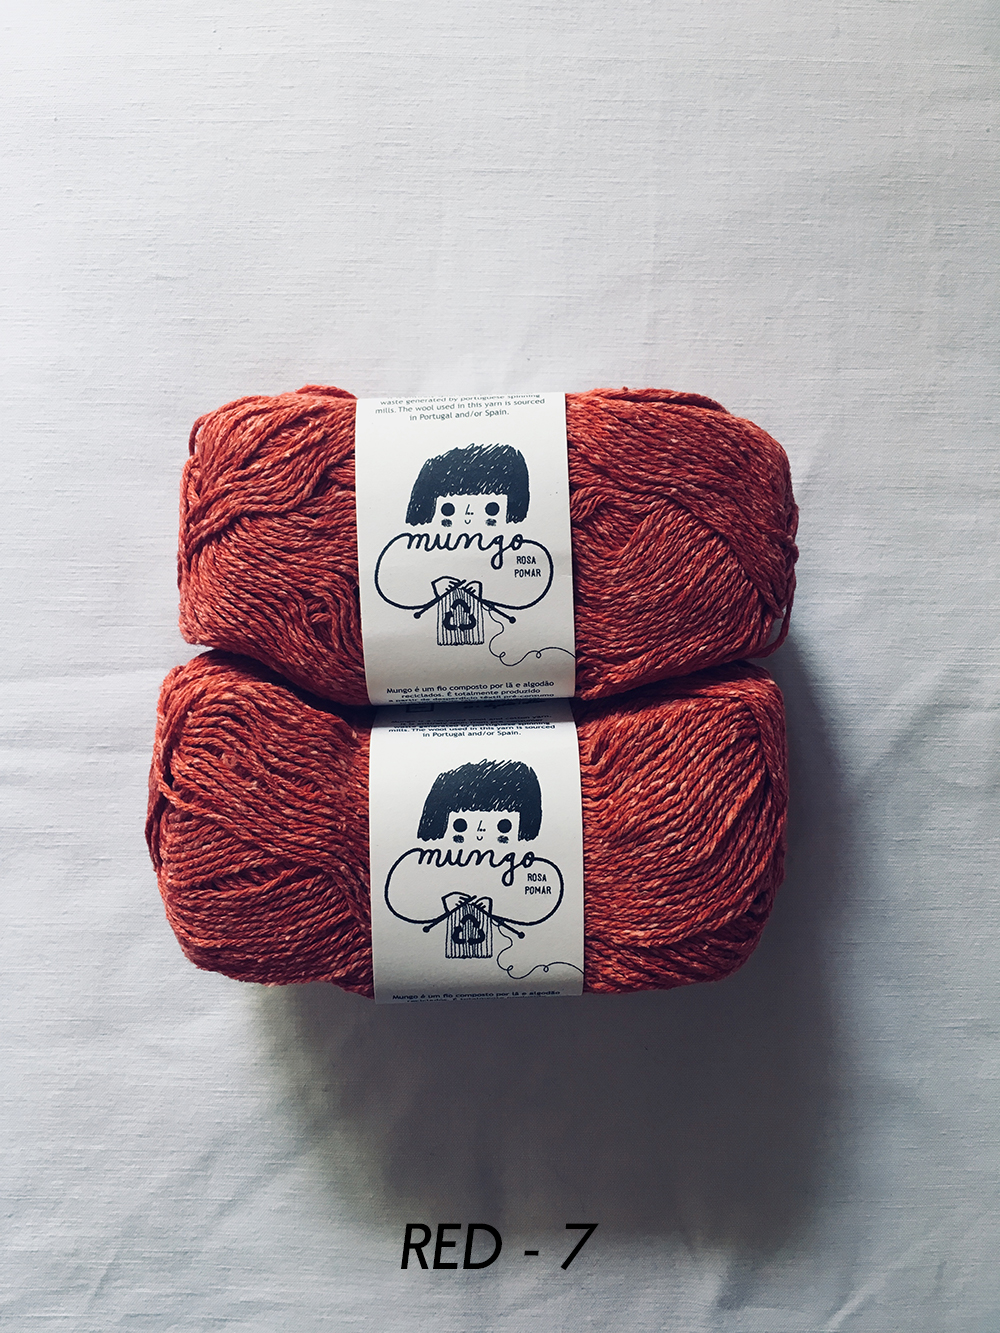 retrosaria_mungo_7_wool_done_knitting.jpg